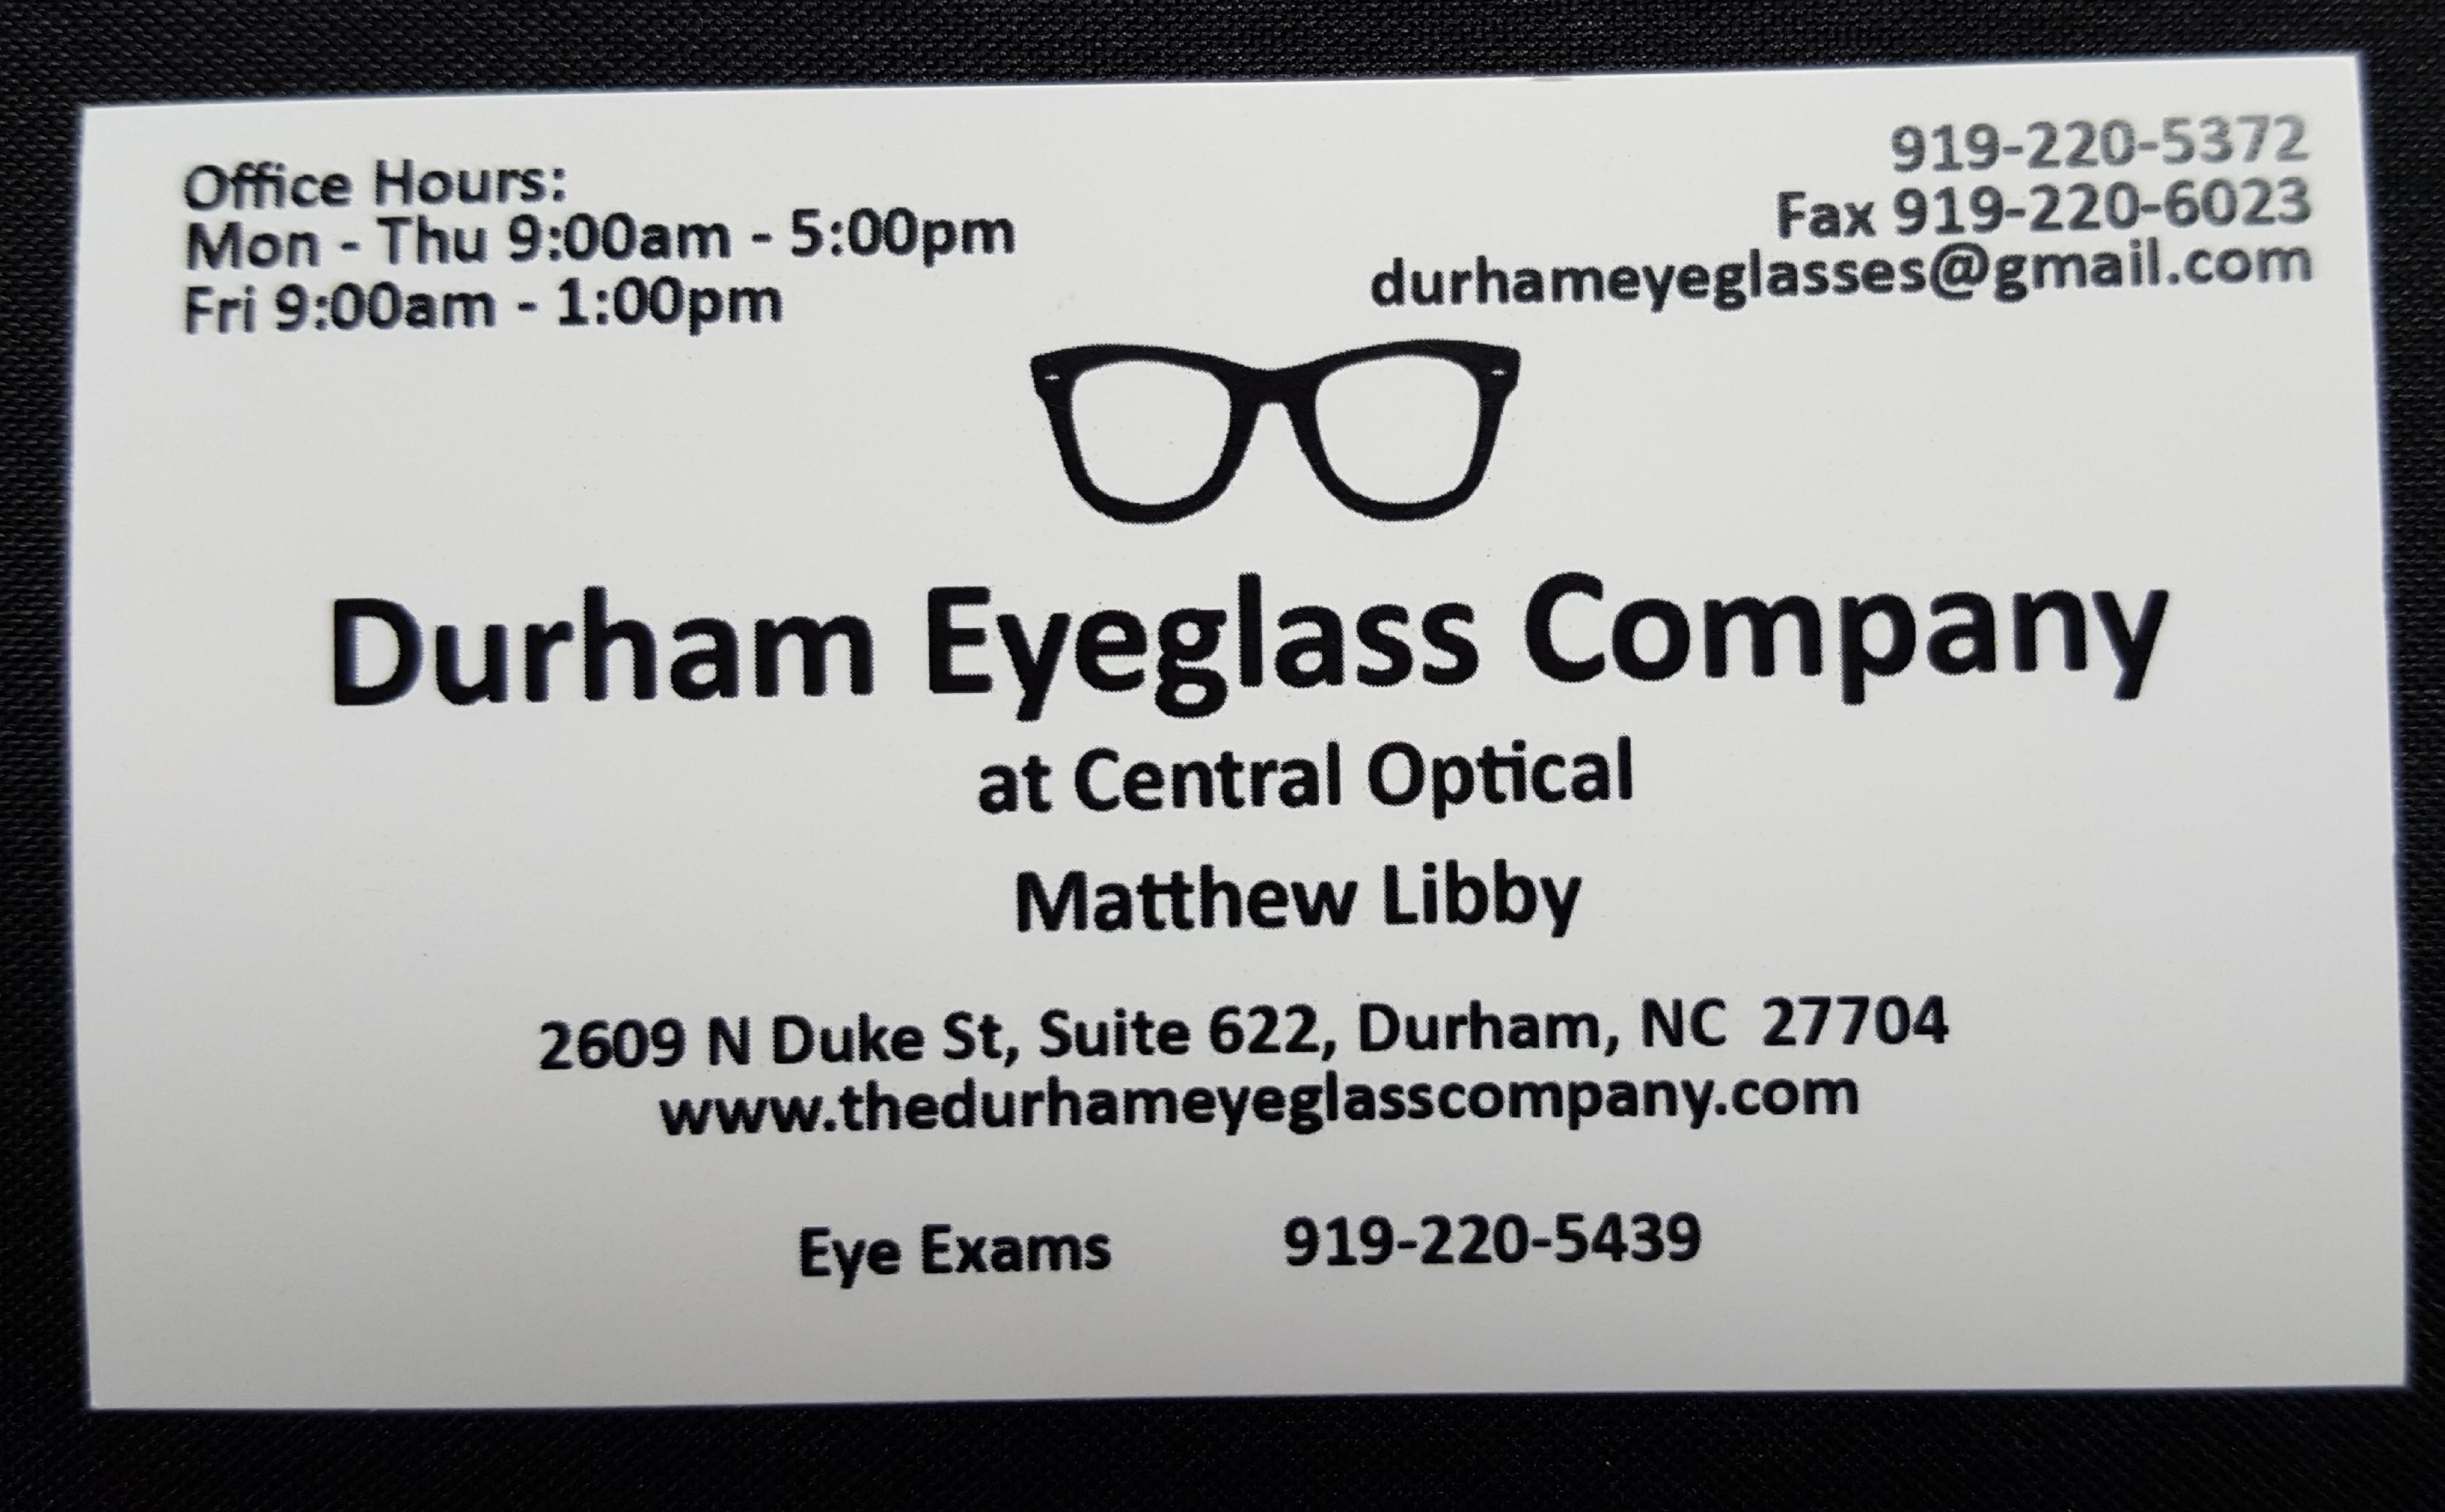 Durham Eyeglass Company